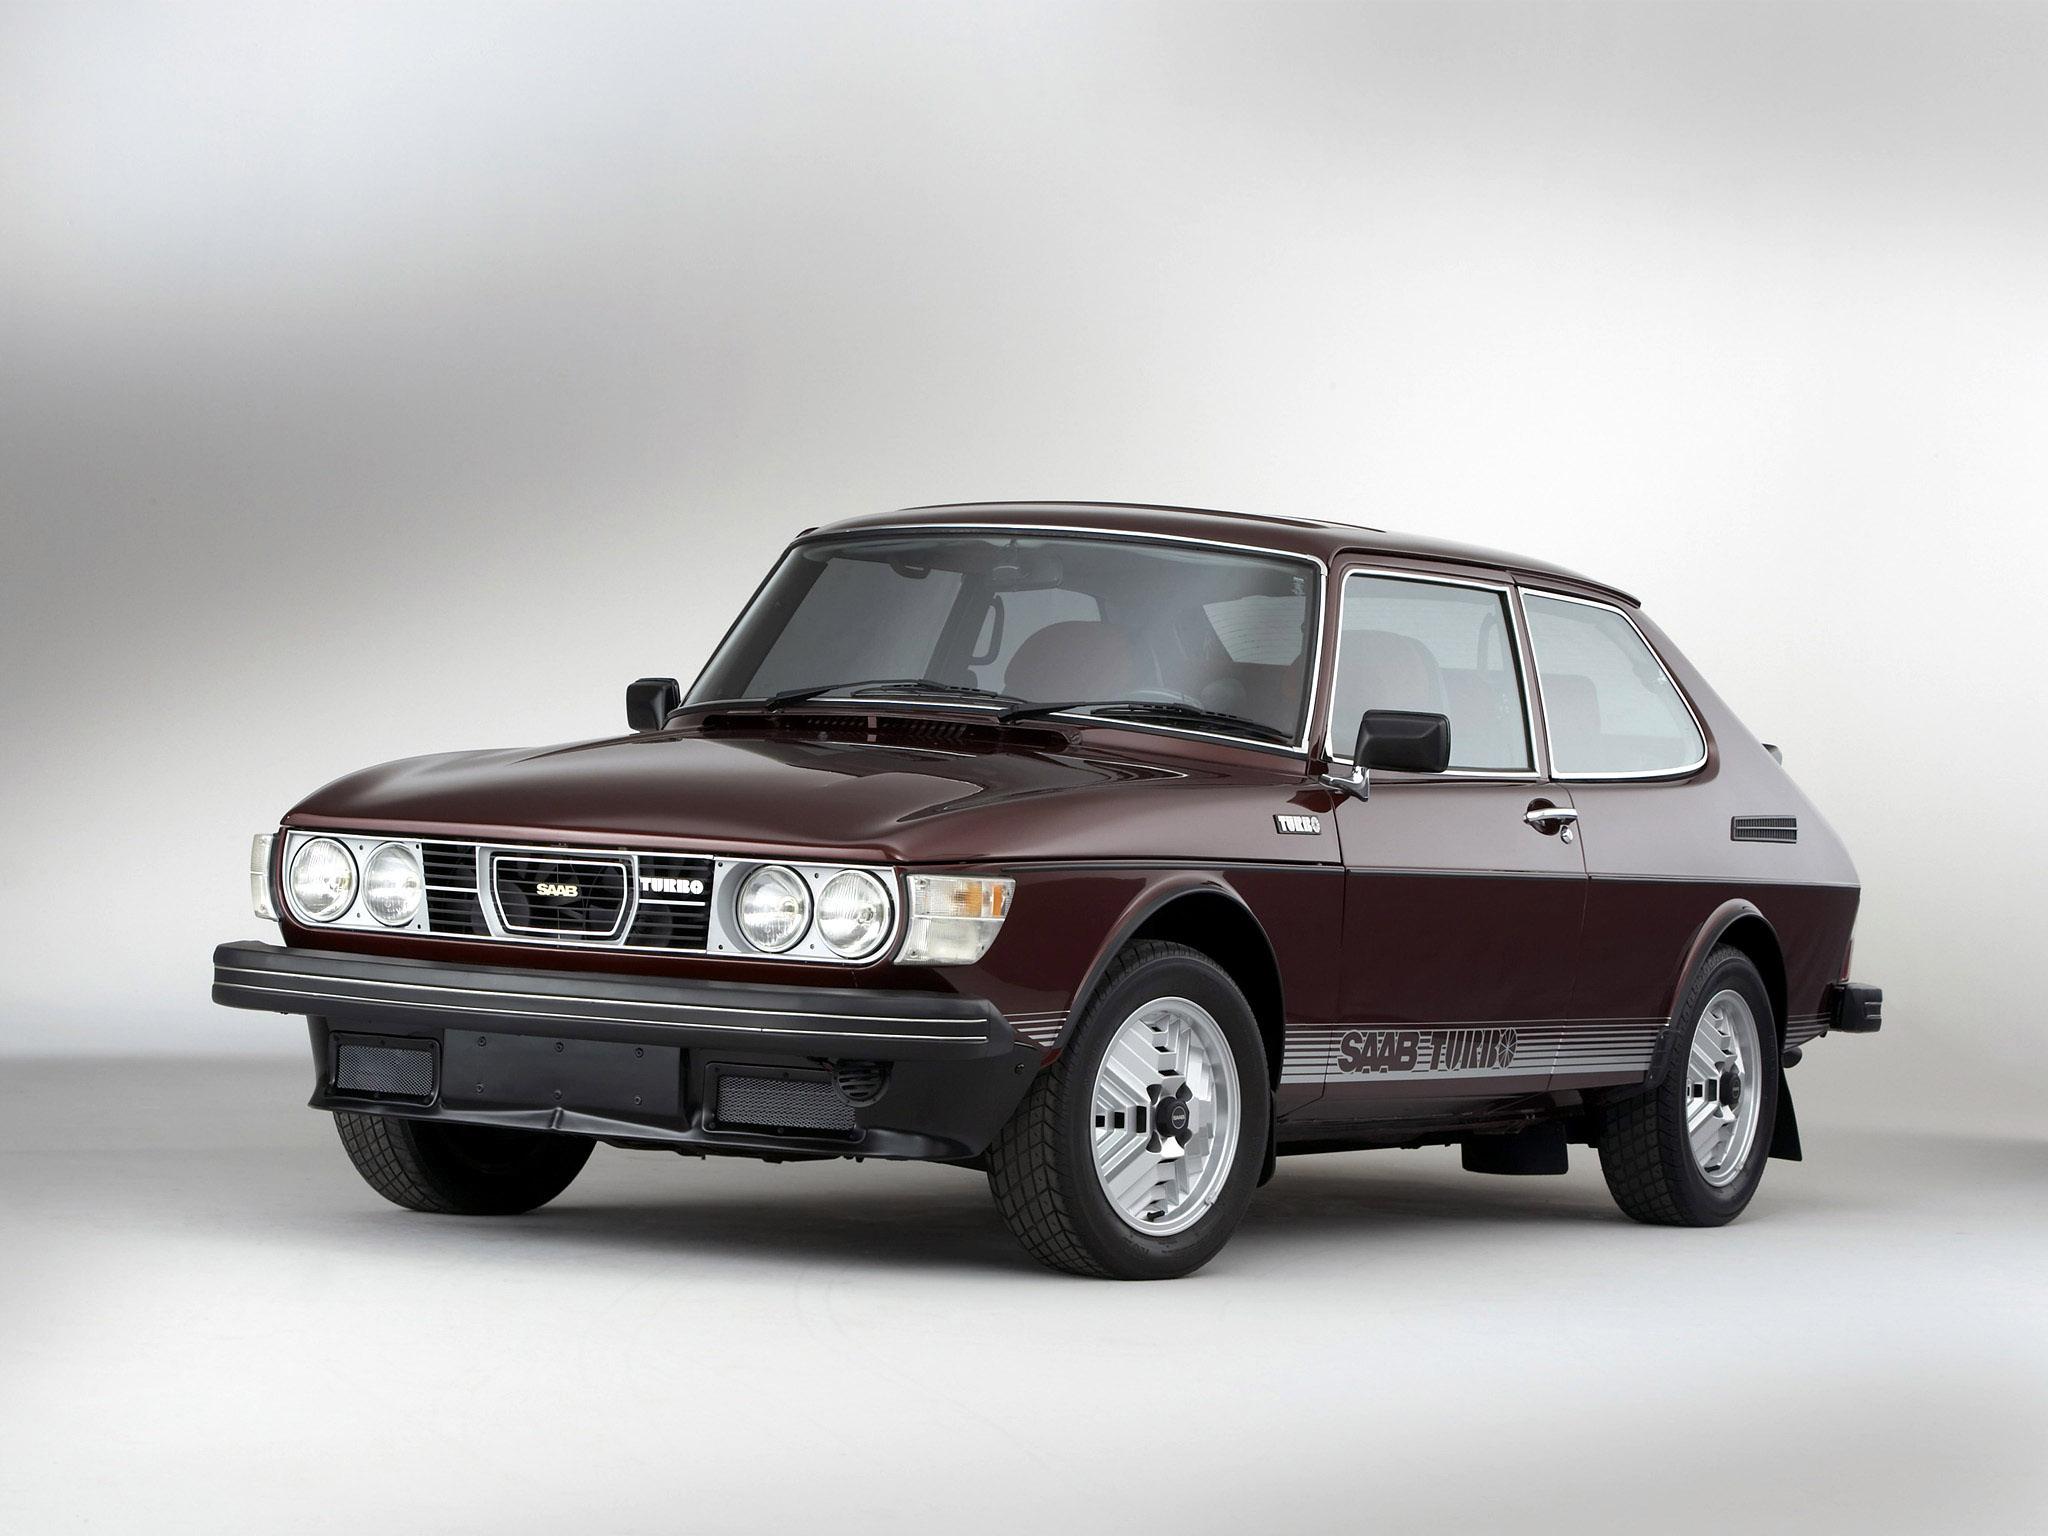 1978_saab_99_turbo_coupe_001_-5418e4a93f219.jpg